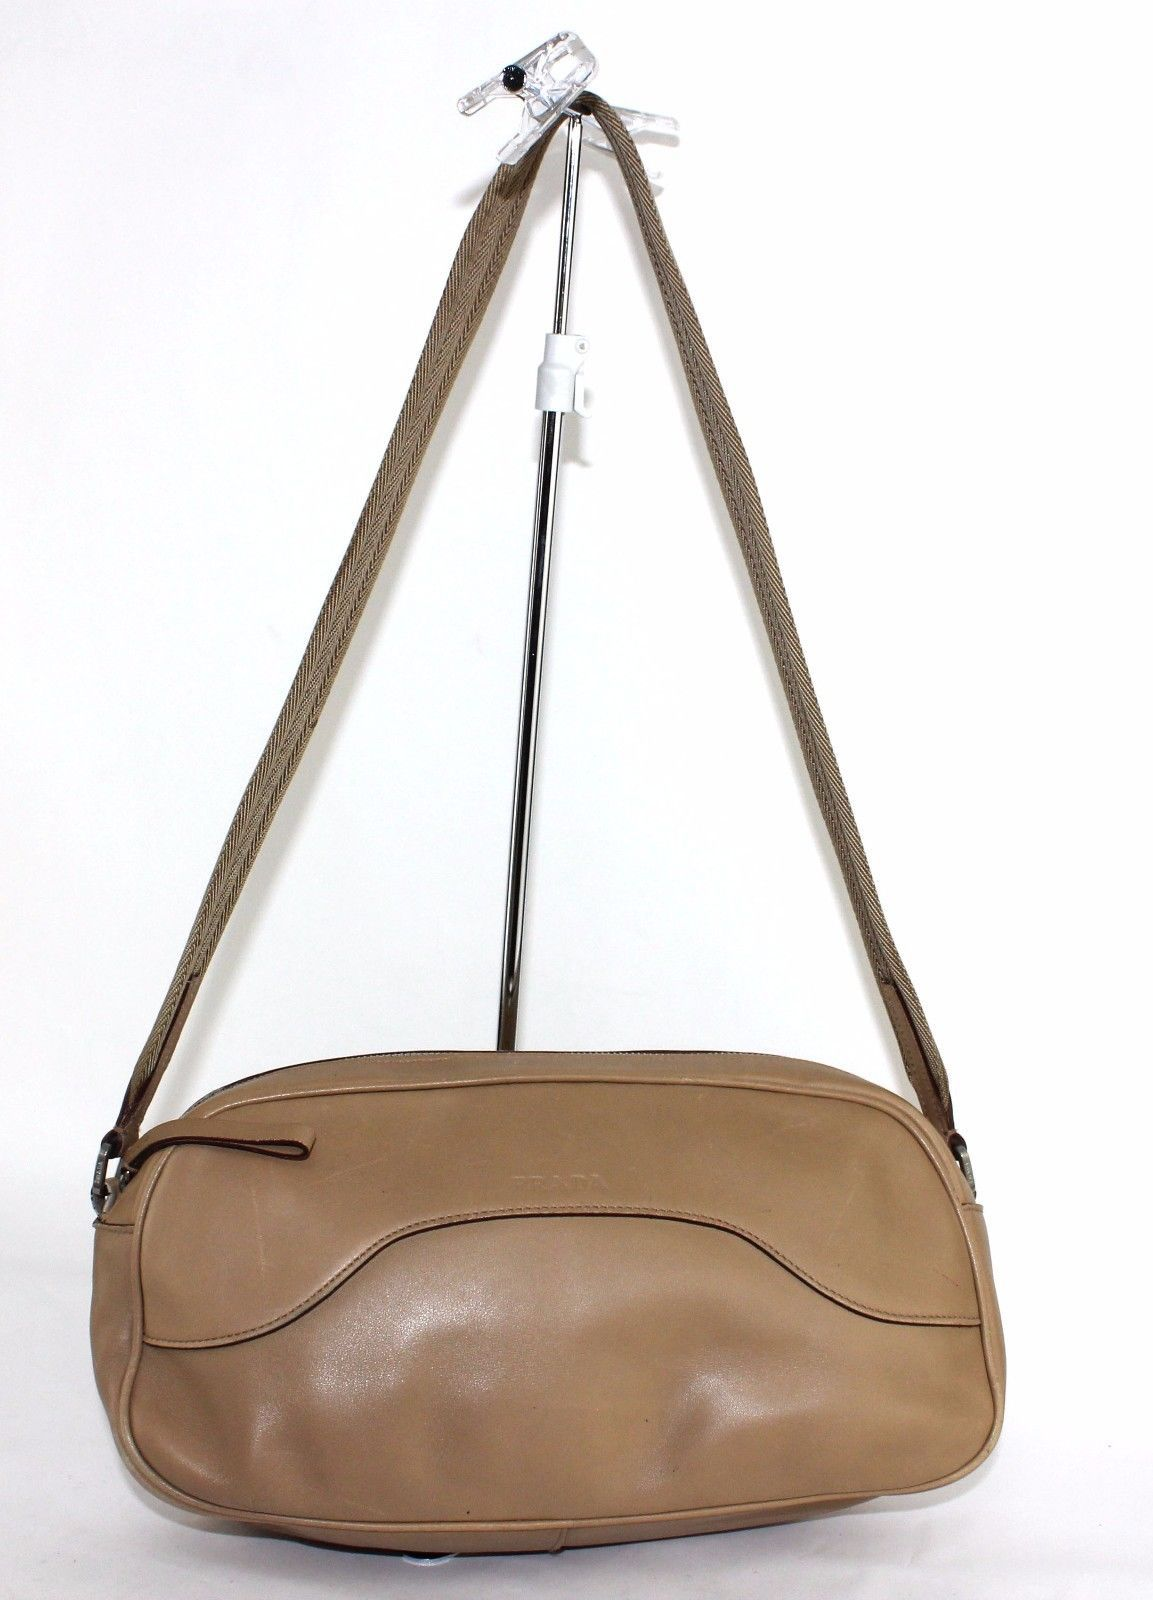 c414176410c5 S l1600. S l1600. Previous. 100% Auth PRADA Milano Light Brown Leather  Shoulder bag Purse Zip Closure Italy